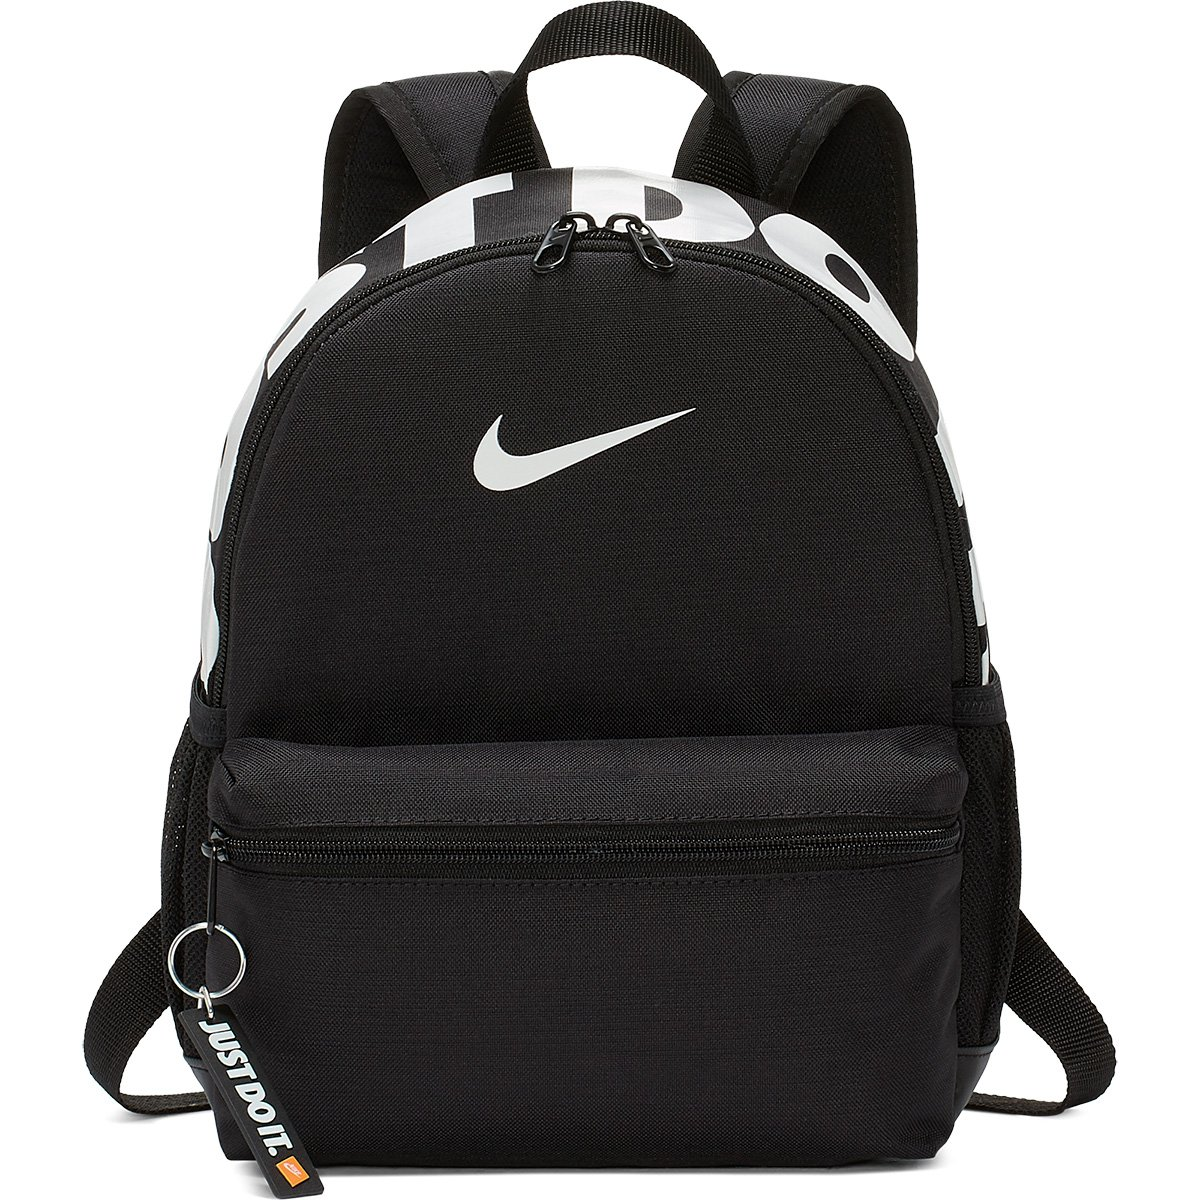 Mochila Infantil Nike Brasília Just do It 11 Litros